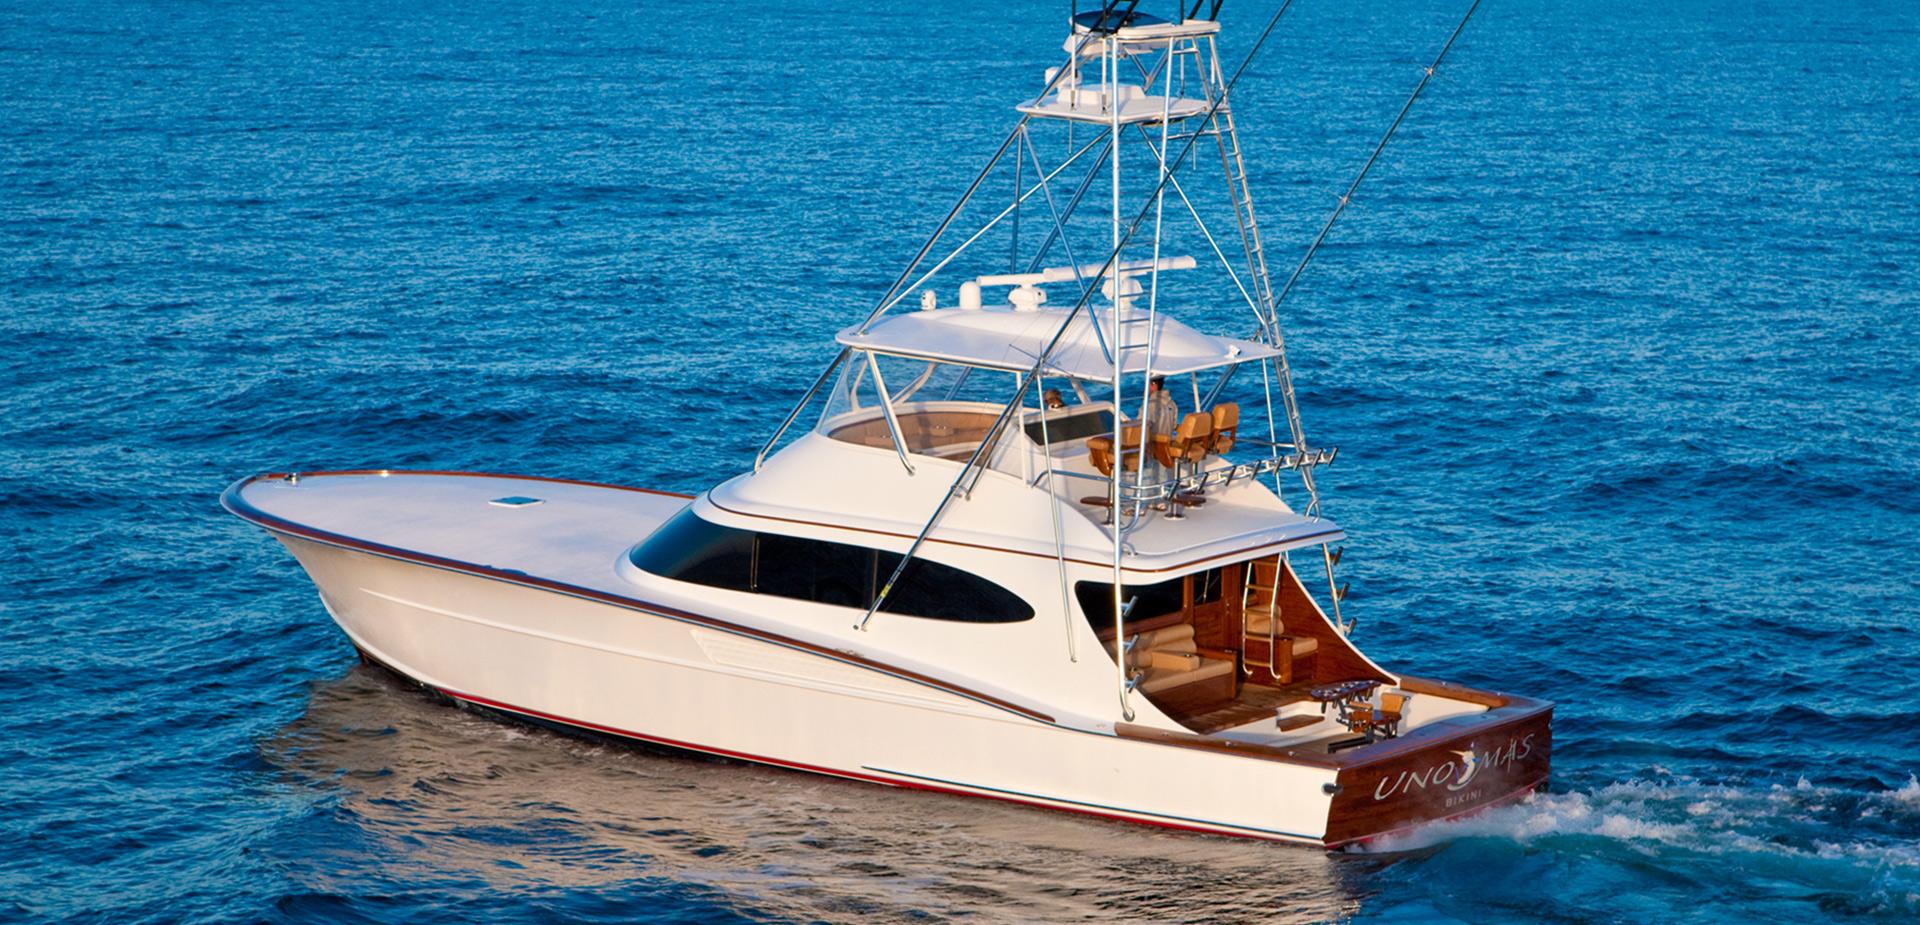 Bayliss 68 Uno Mas  Custom Sport Fishing Boat  Bayliss